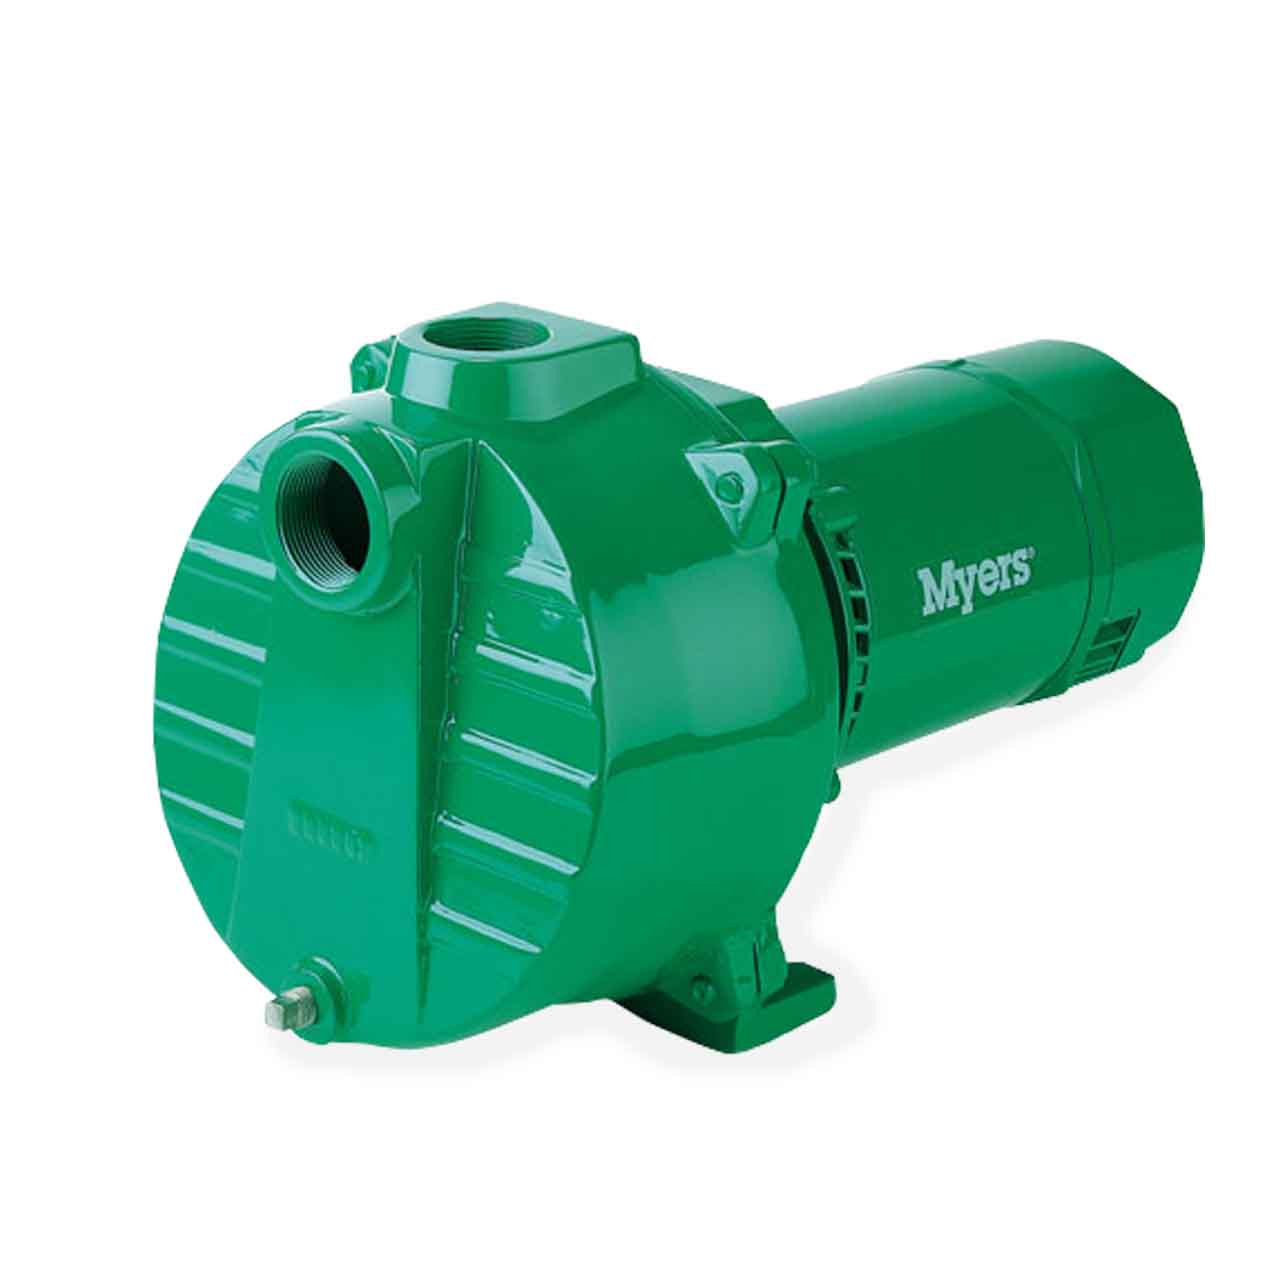 Myers - Myers QP20 Quick Prime Self-Priming Centrifugal Pump 2.0 HP 230V  1PH #MYR20590D003